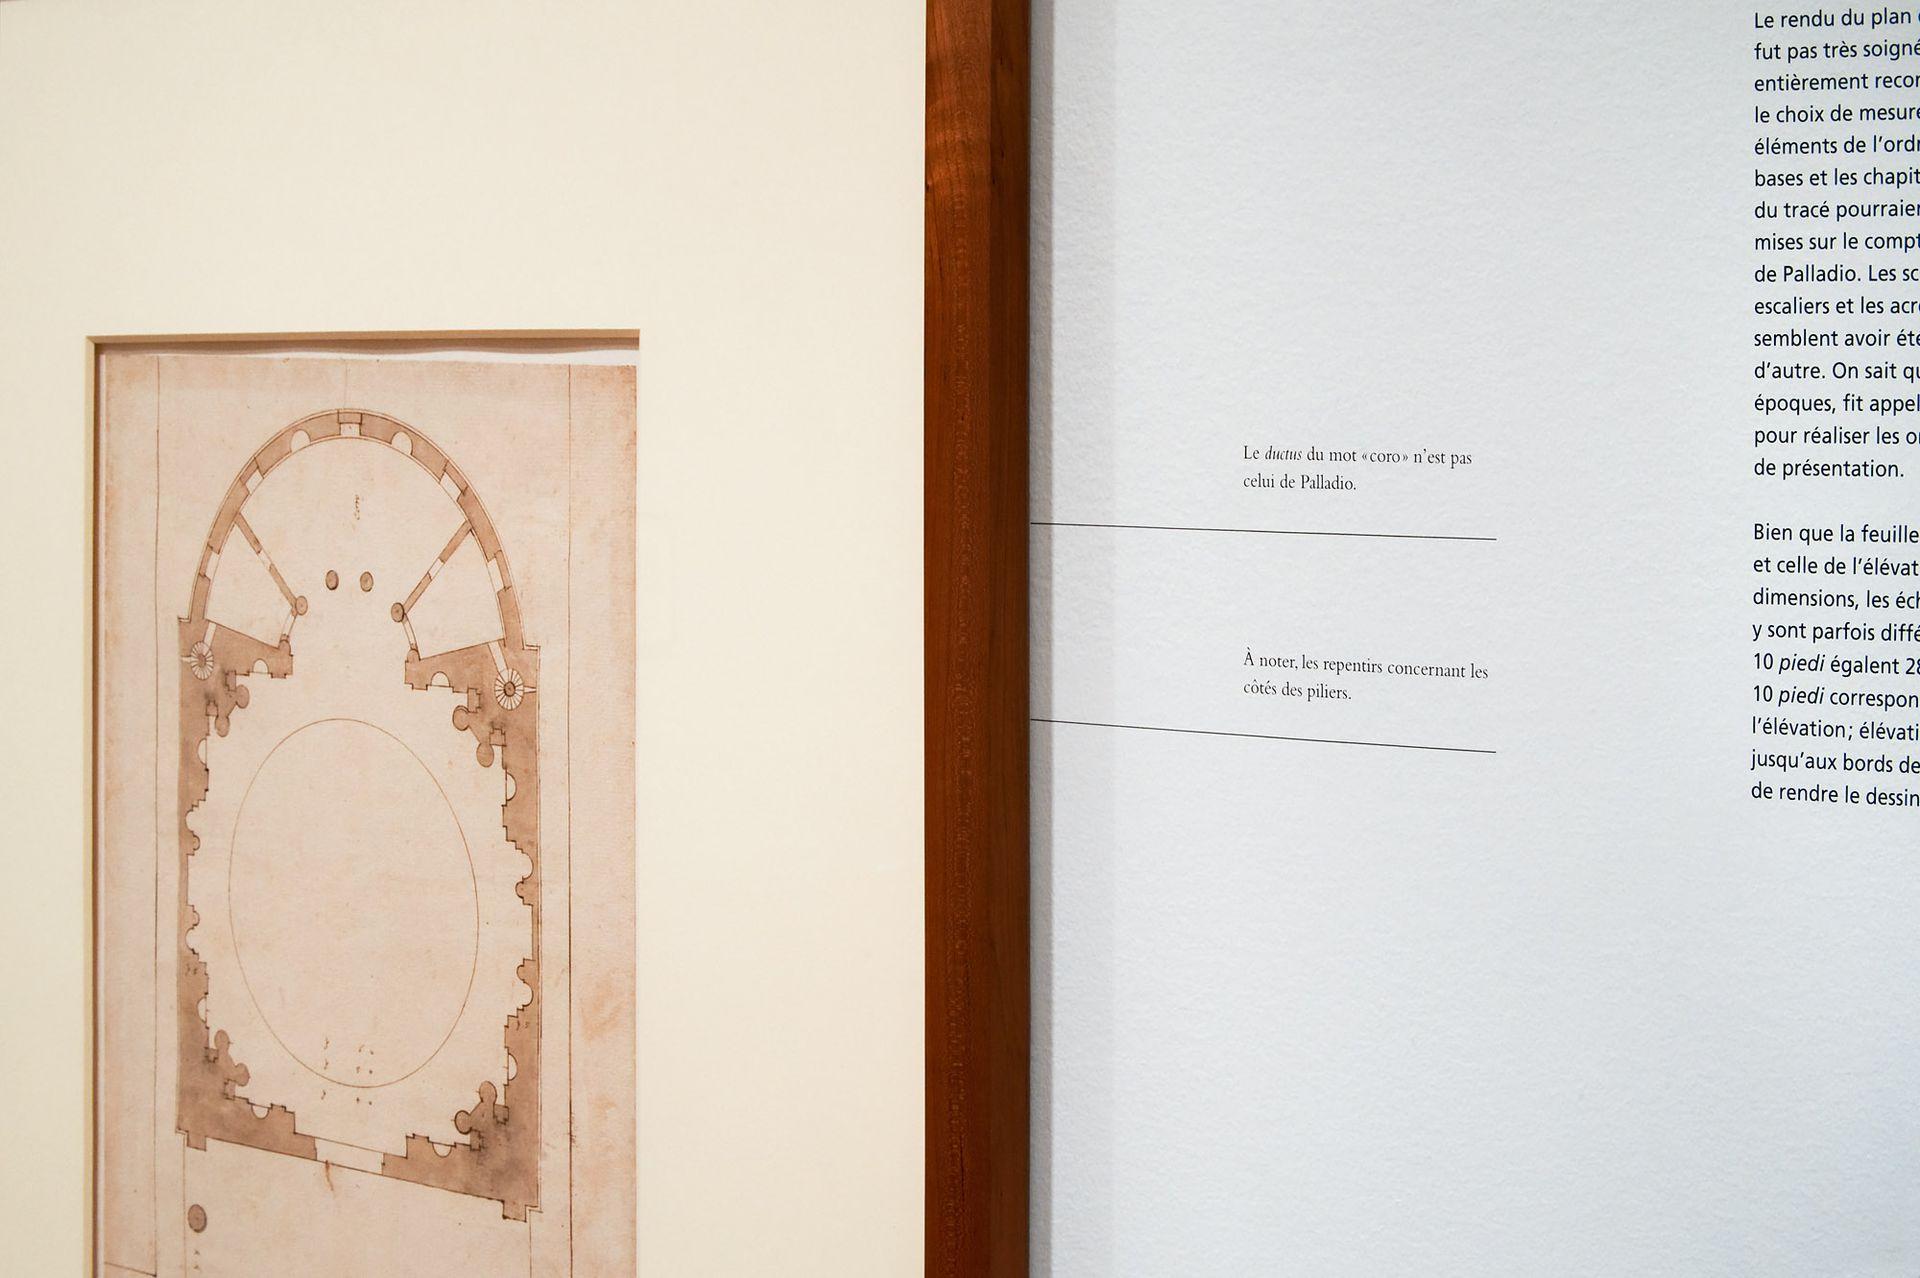 palladio essays Andrea palladio hi̇s li̇fe and hi̇s archi̇tecture muhammed emin akben history of architecture international university of sarajevo andrea palladio.